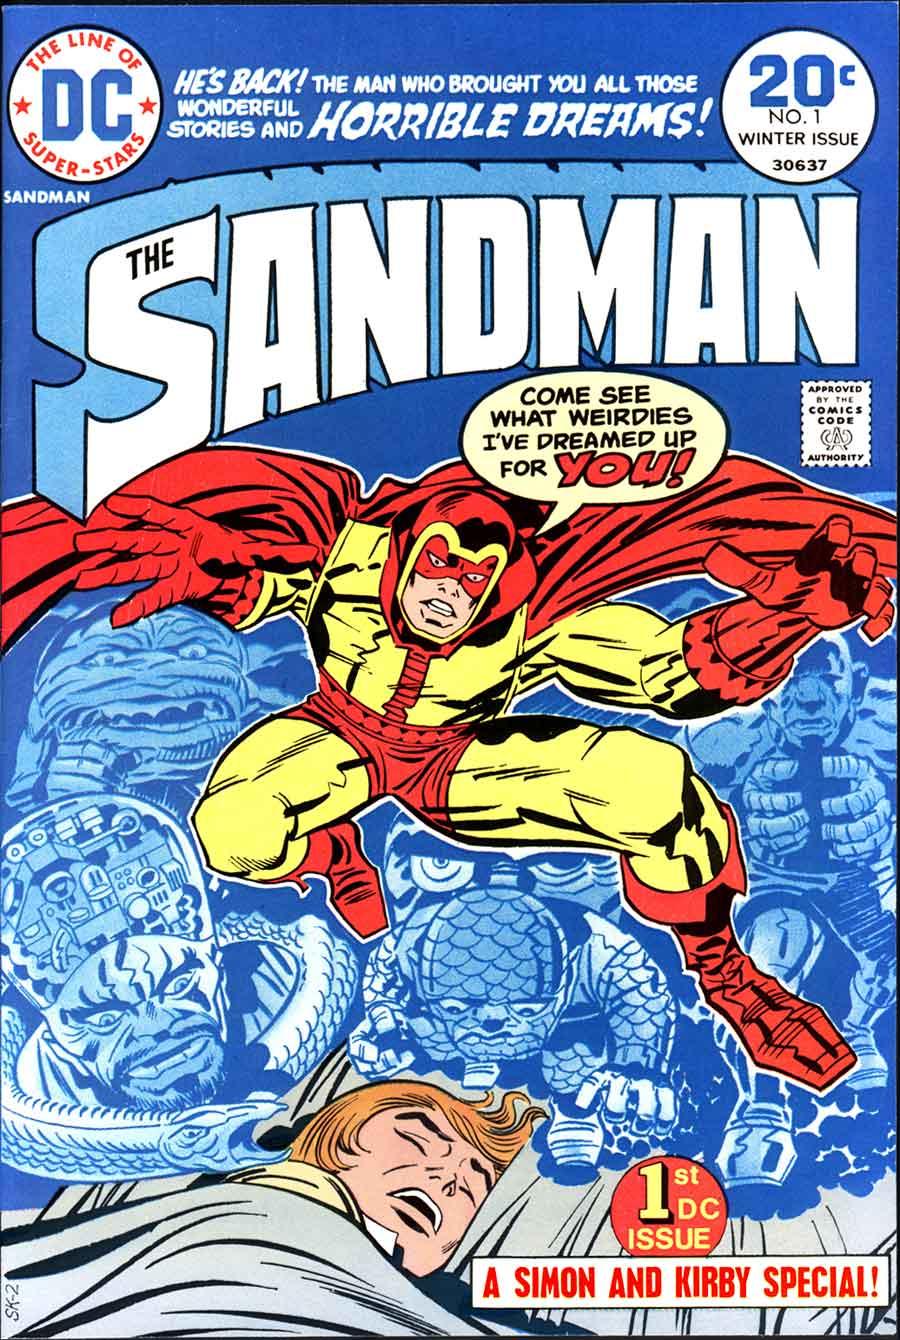 The Sandman v1 #1 dc bronze age comic book cover art by Jack Kirby